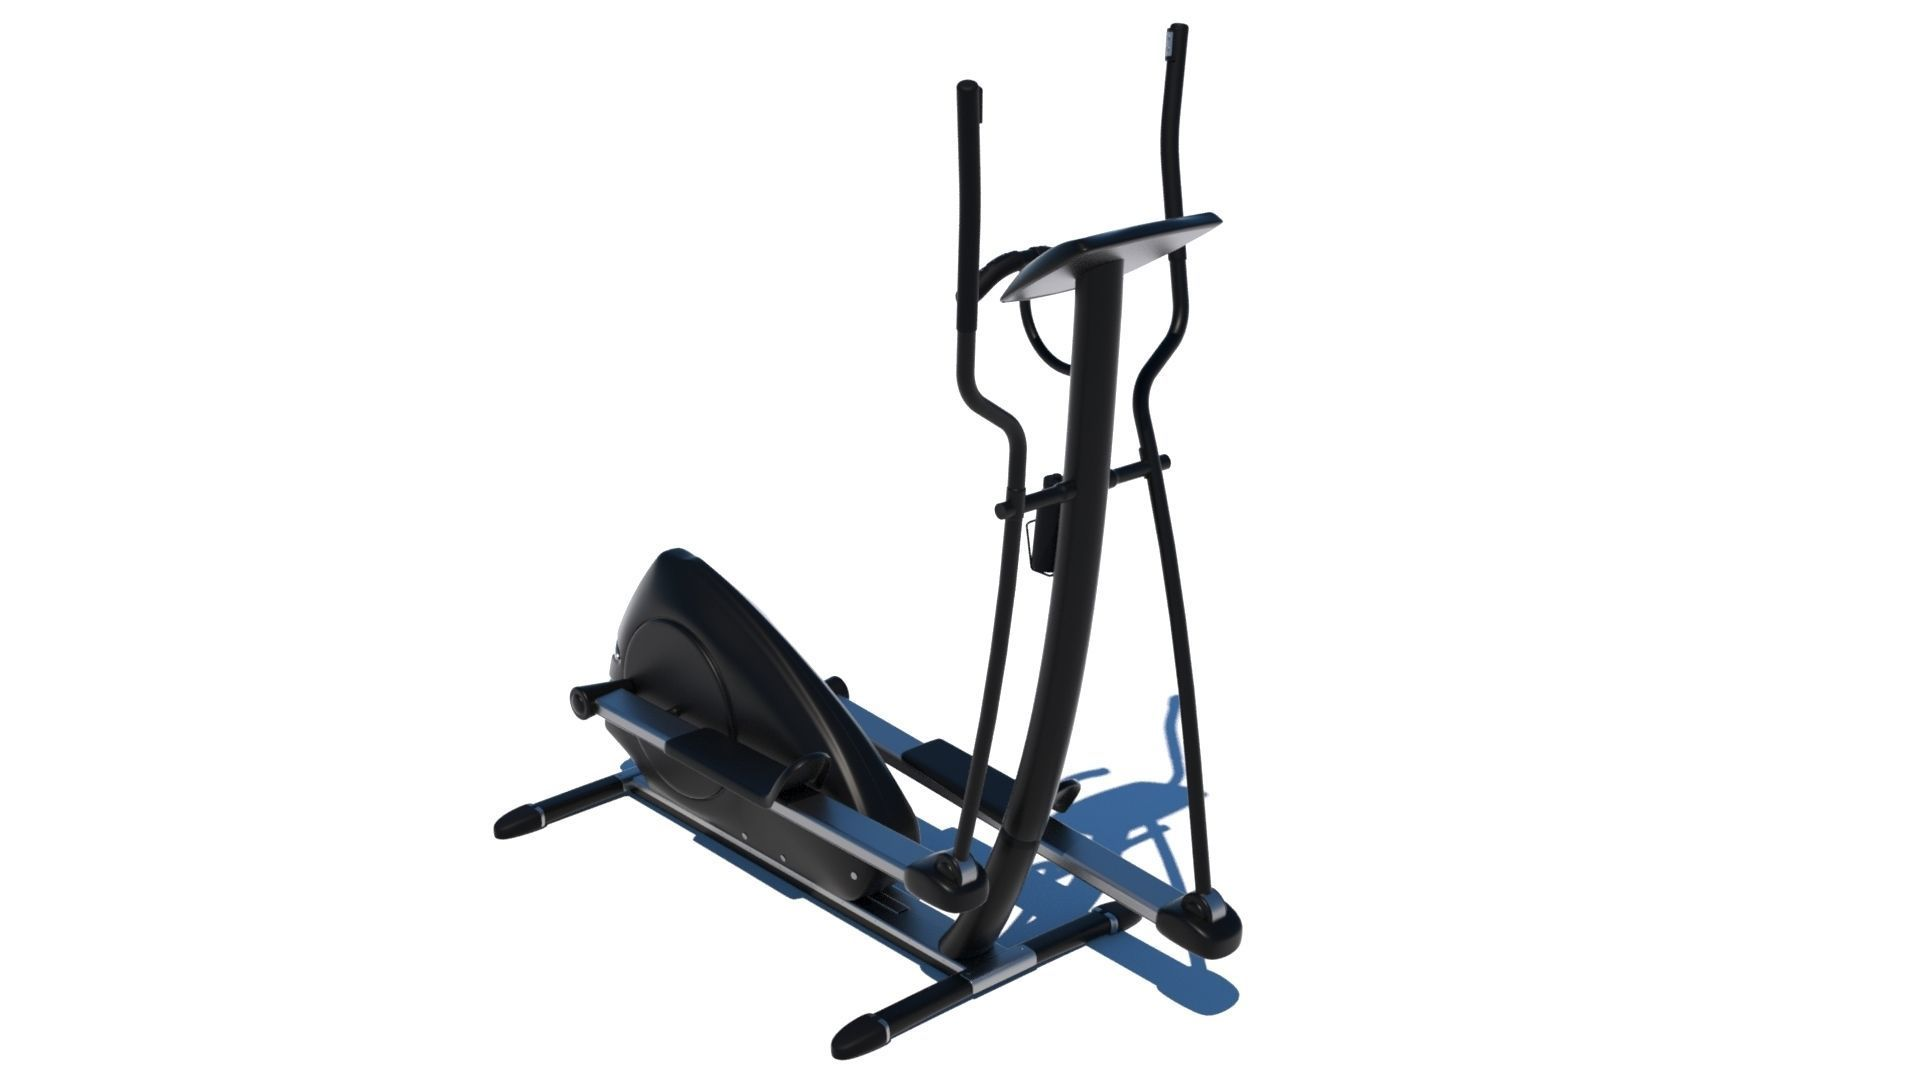 Gym Elliptical Machine - Octane and Mental Ray